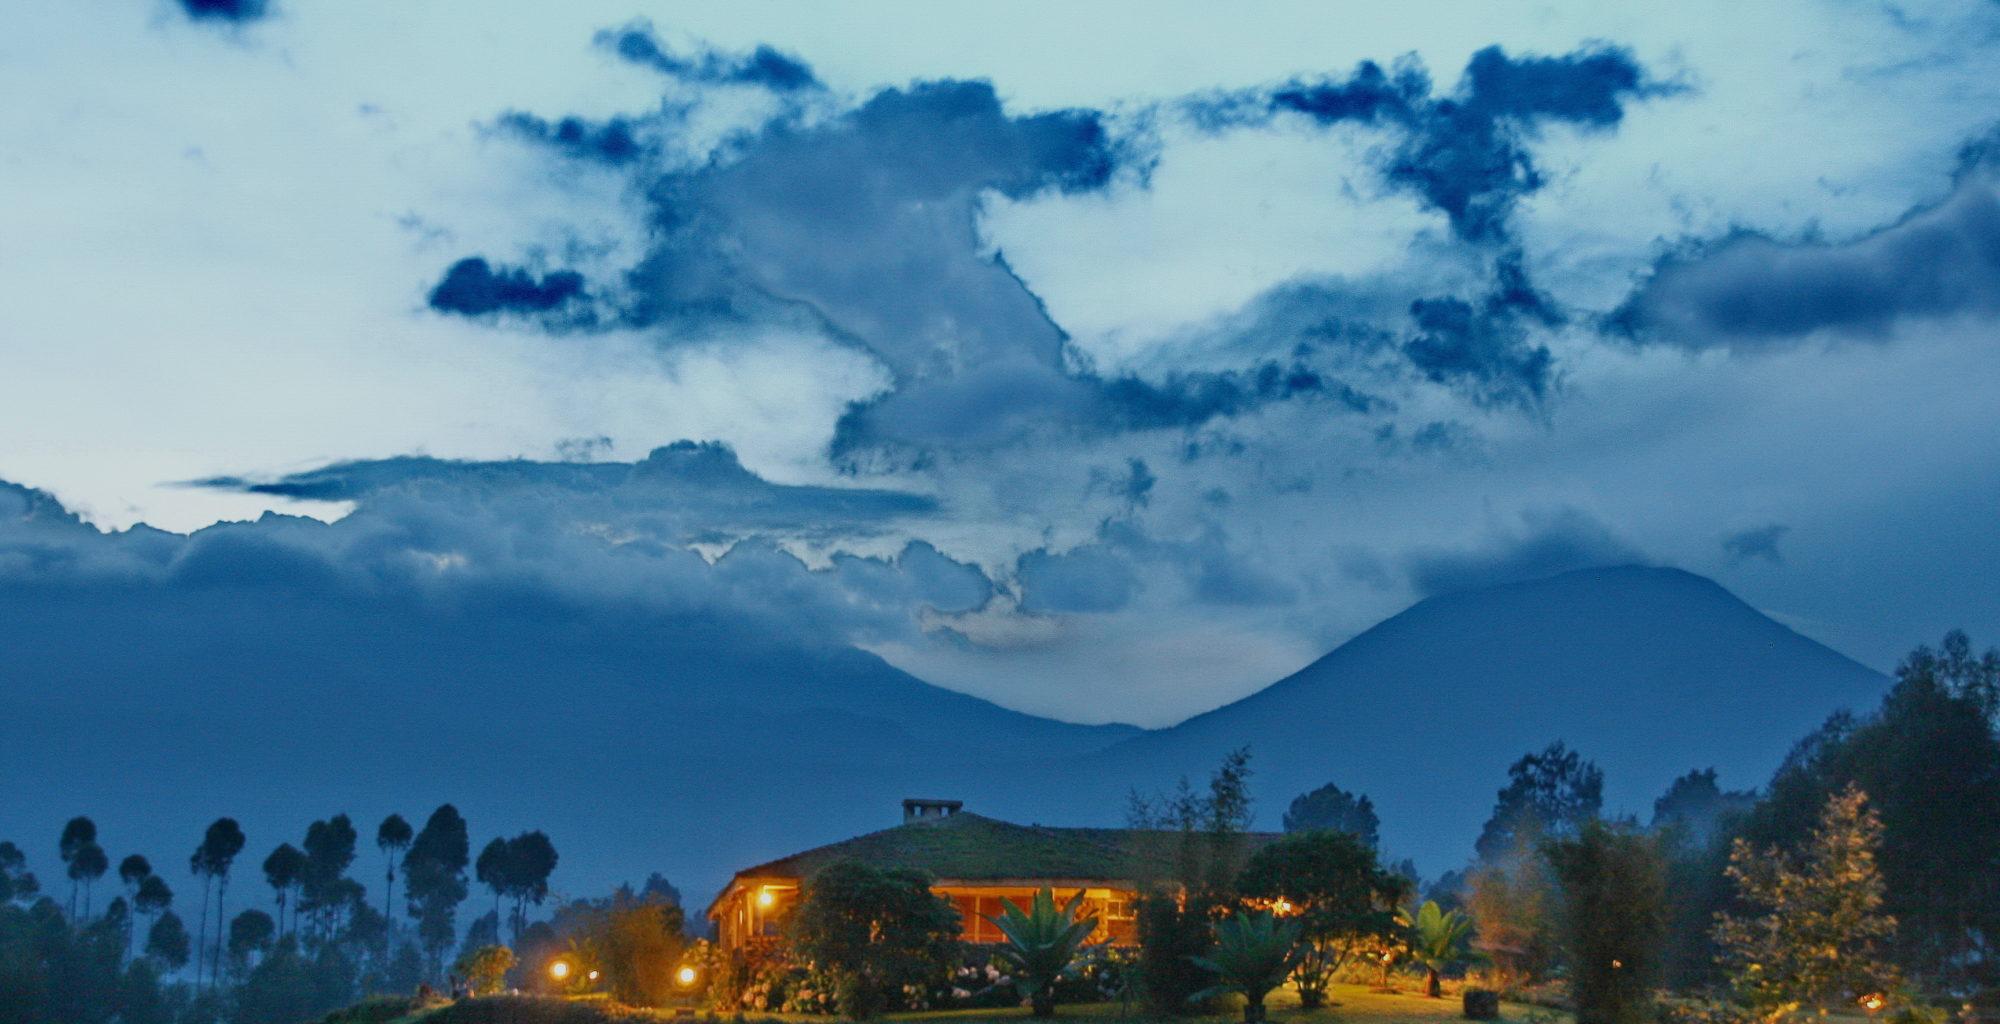 Jack Hanna Guesthouse Rwanda View Evening